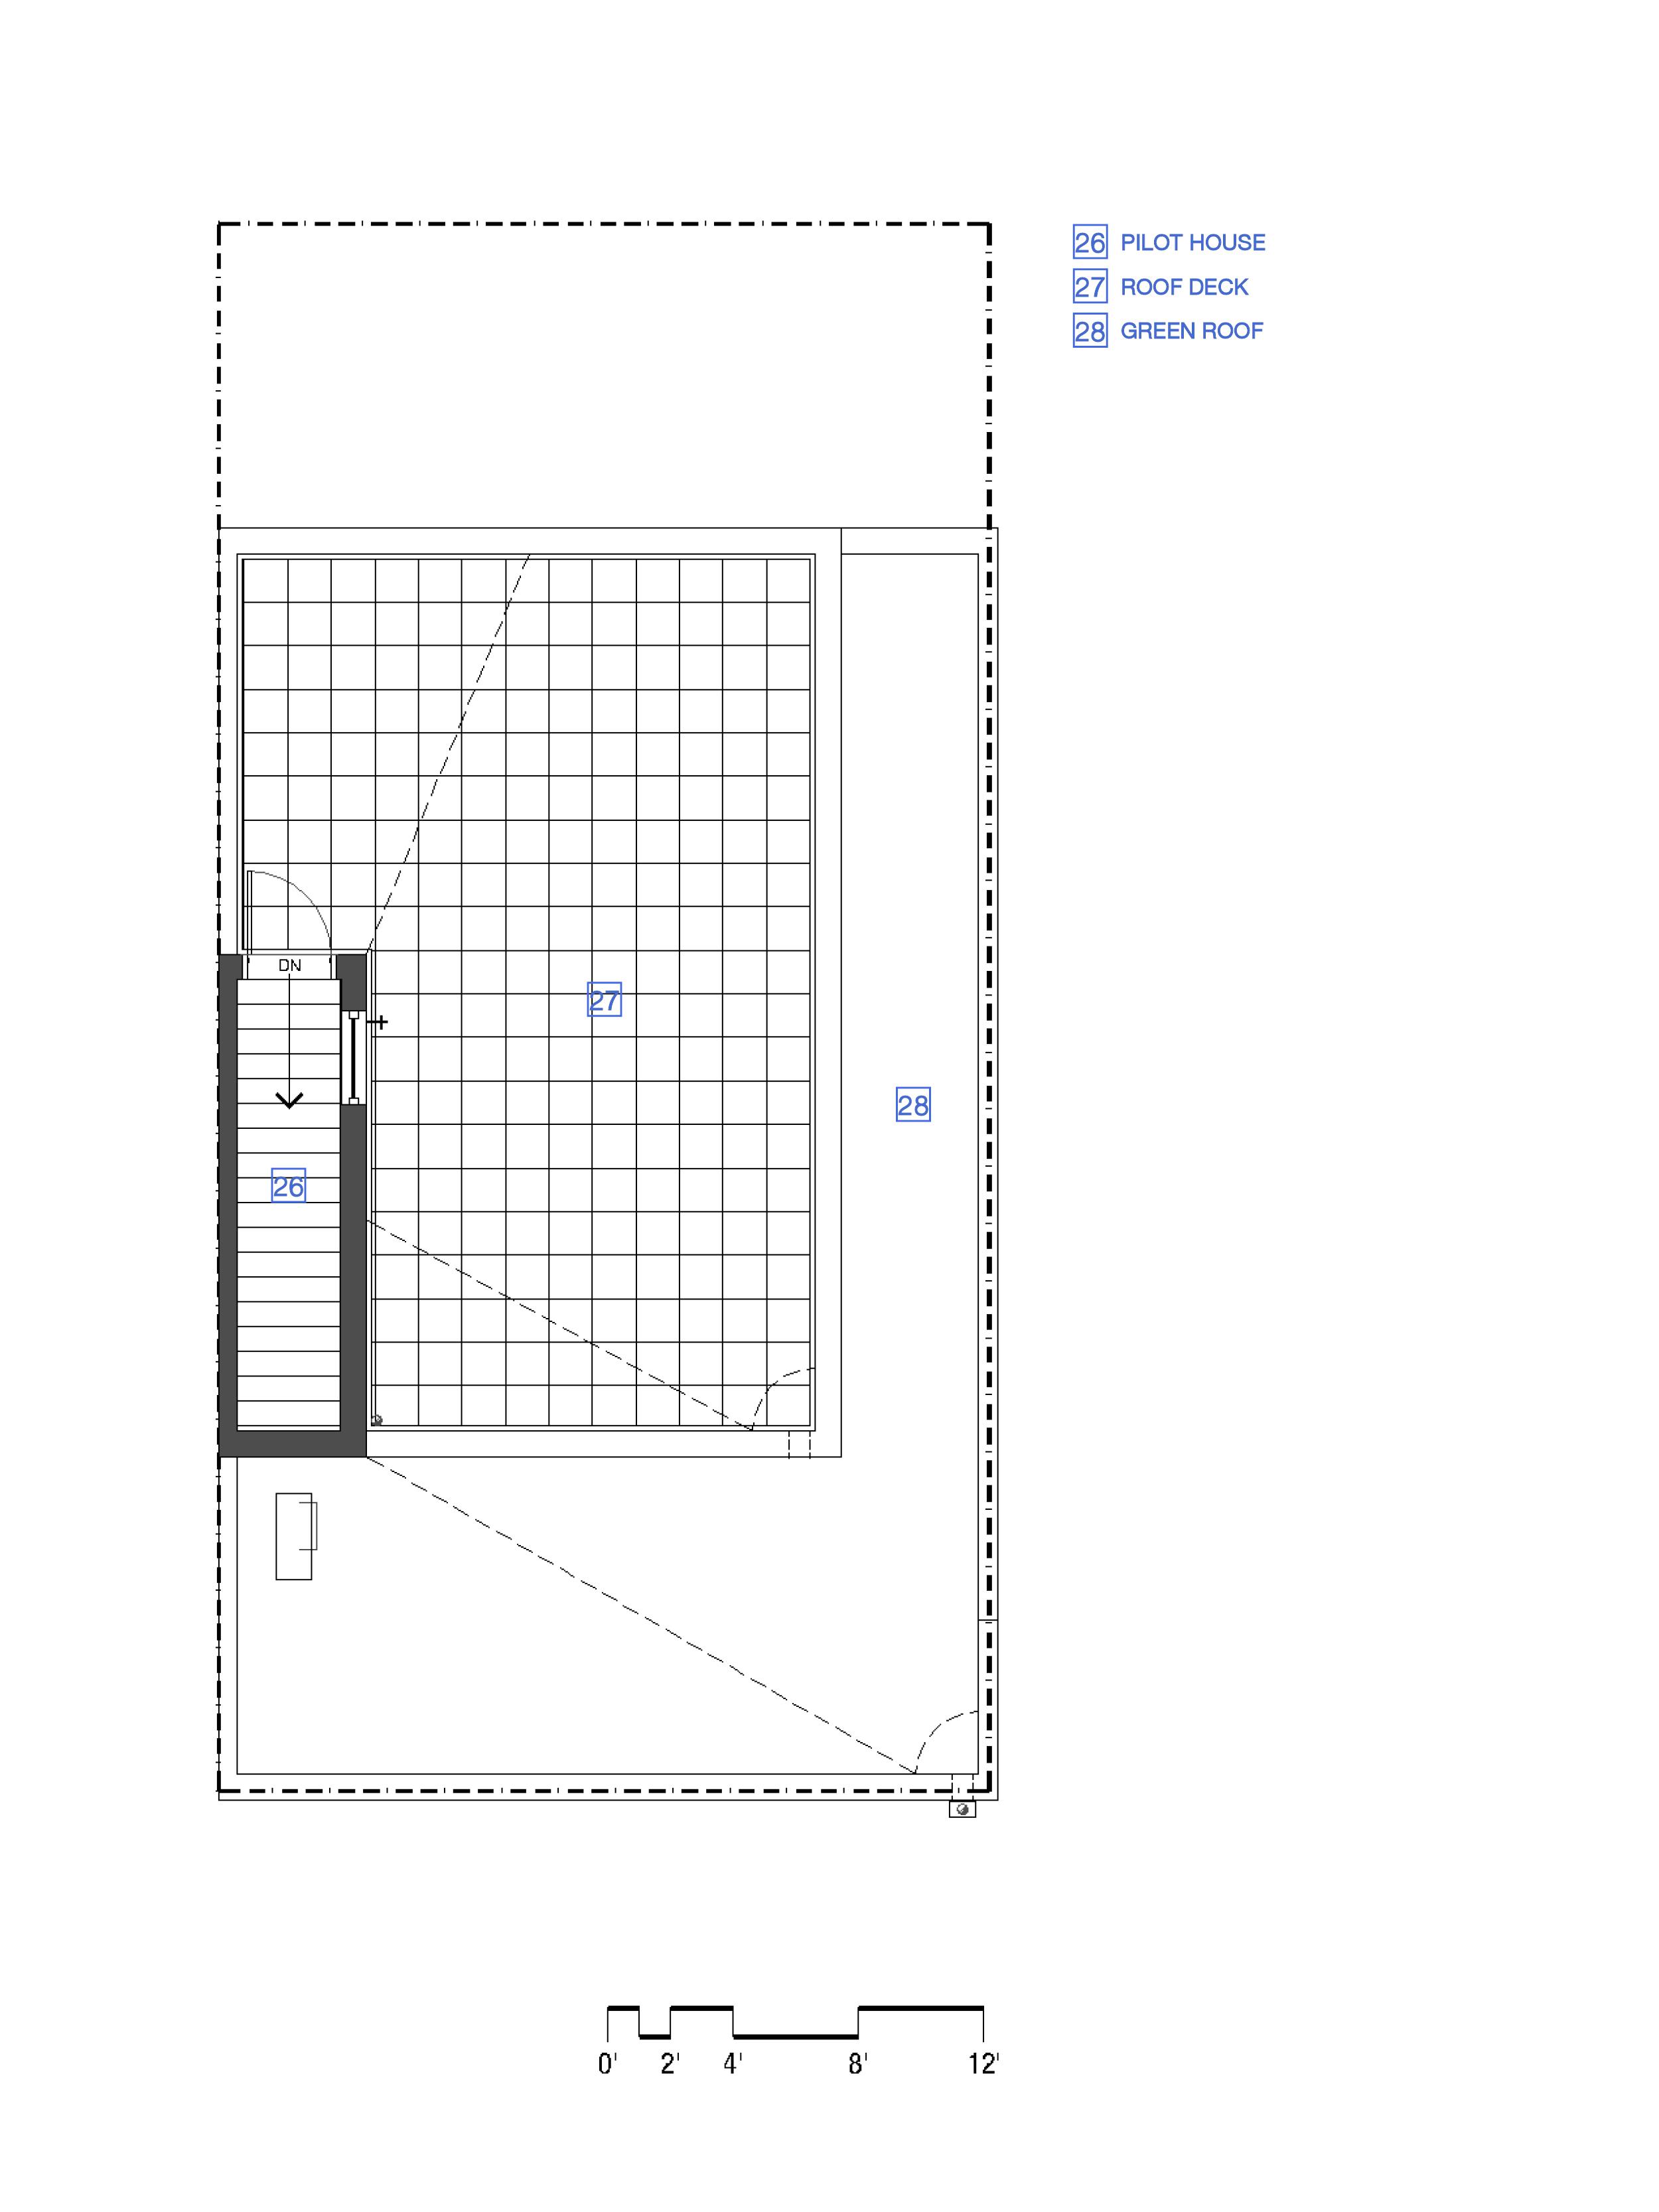 Roof Deck - Unit 'B'